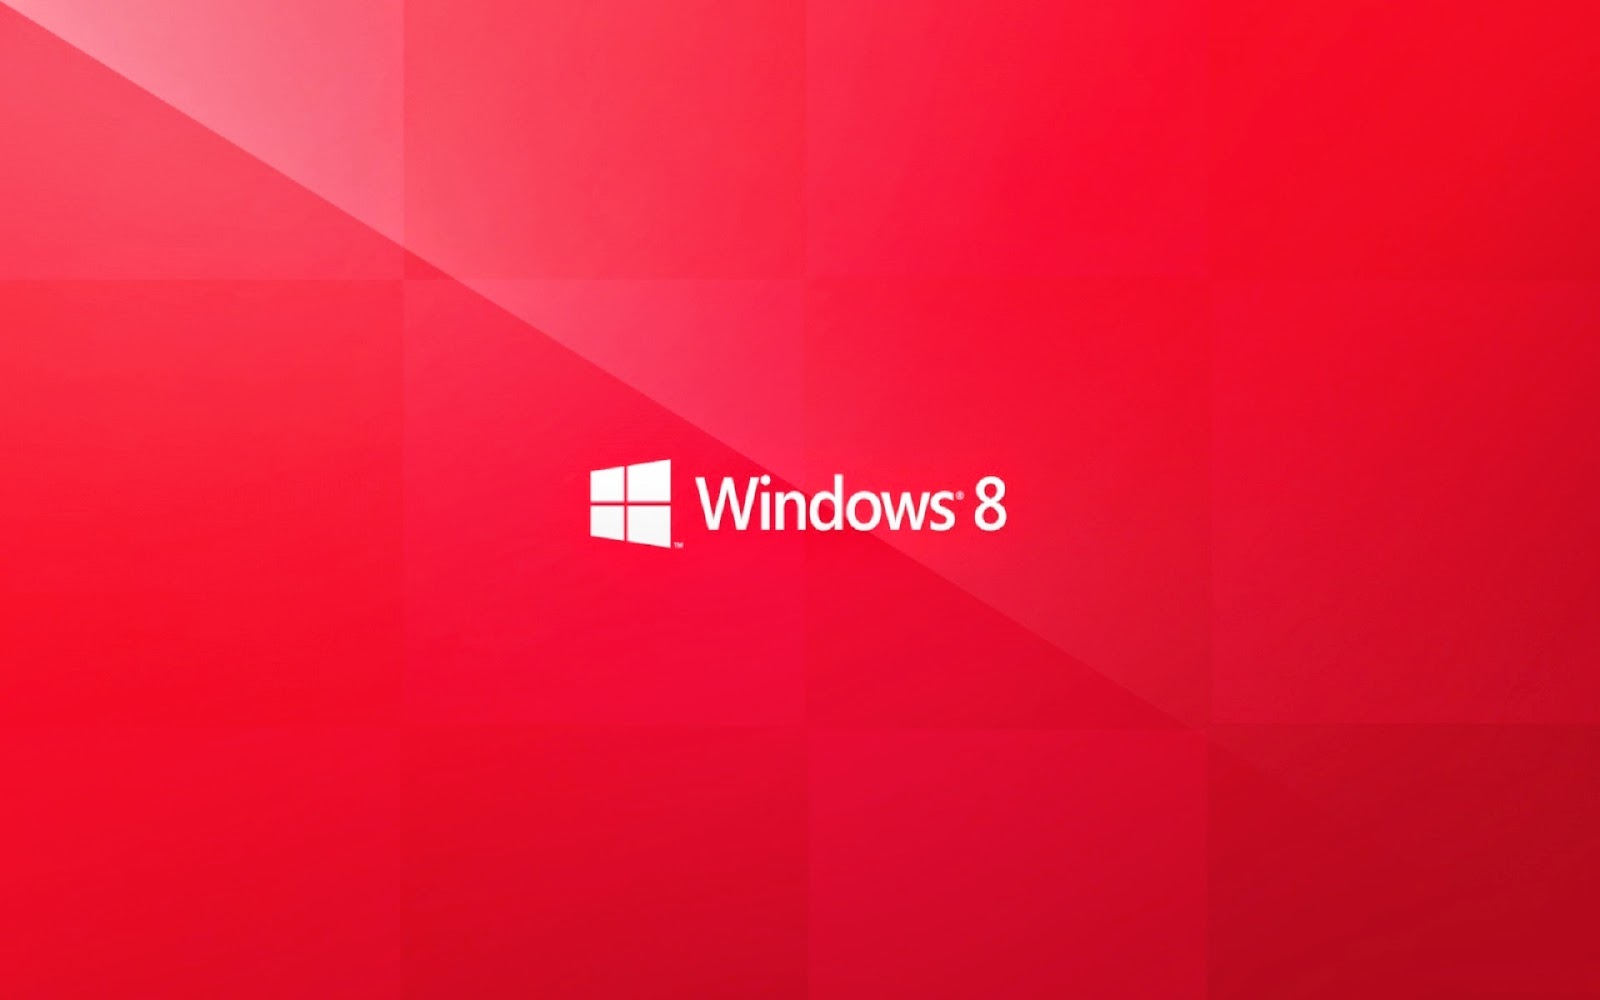 windows 81 wallpaper hd 1366x768 wallpapersafari